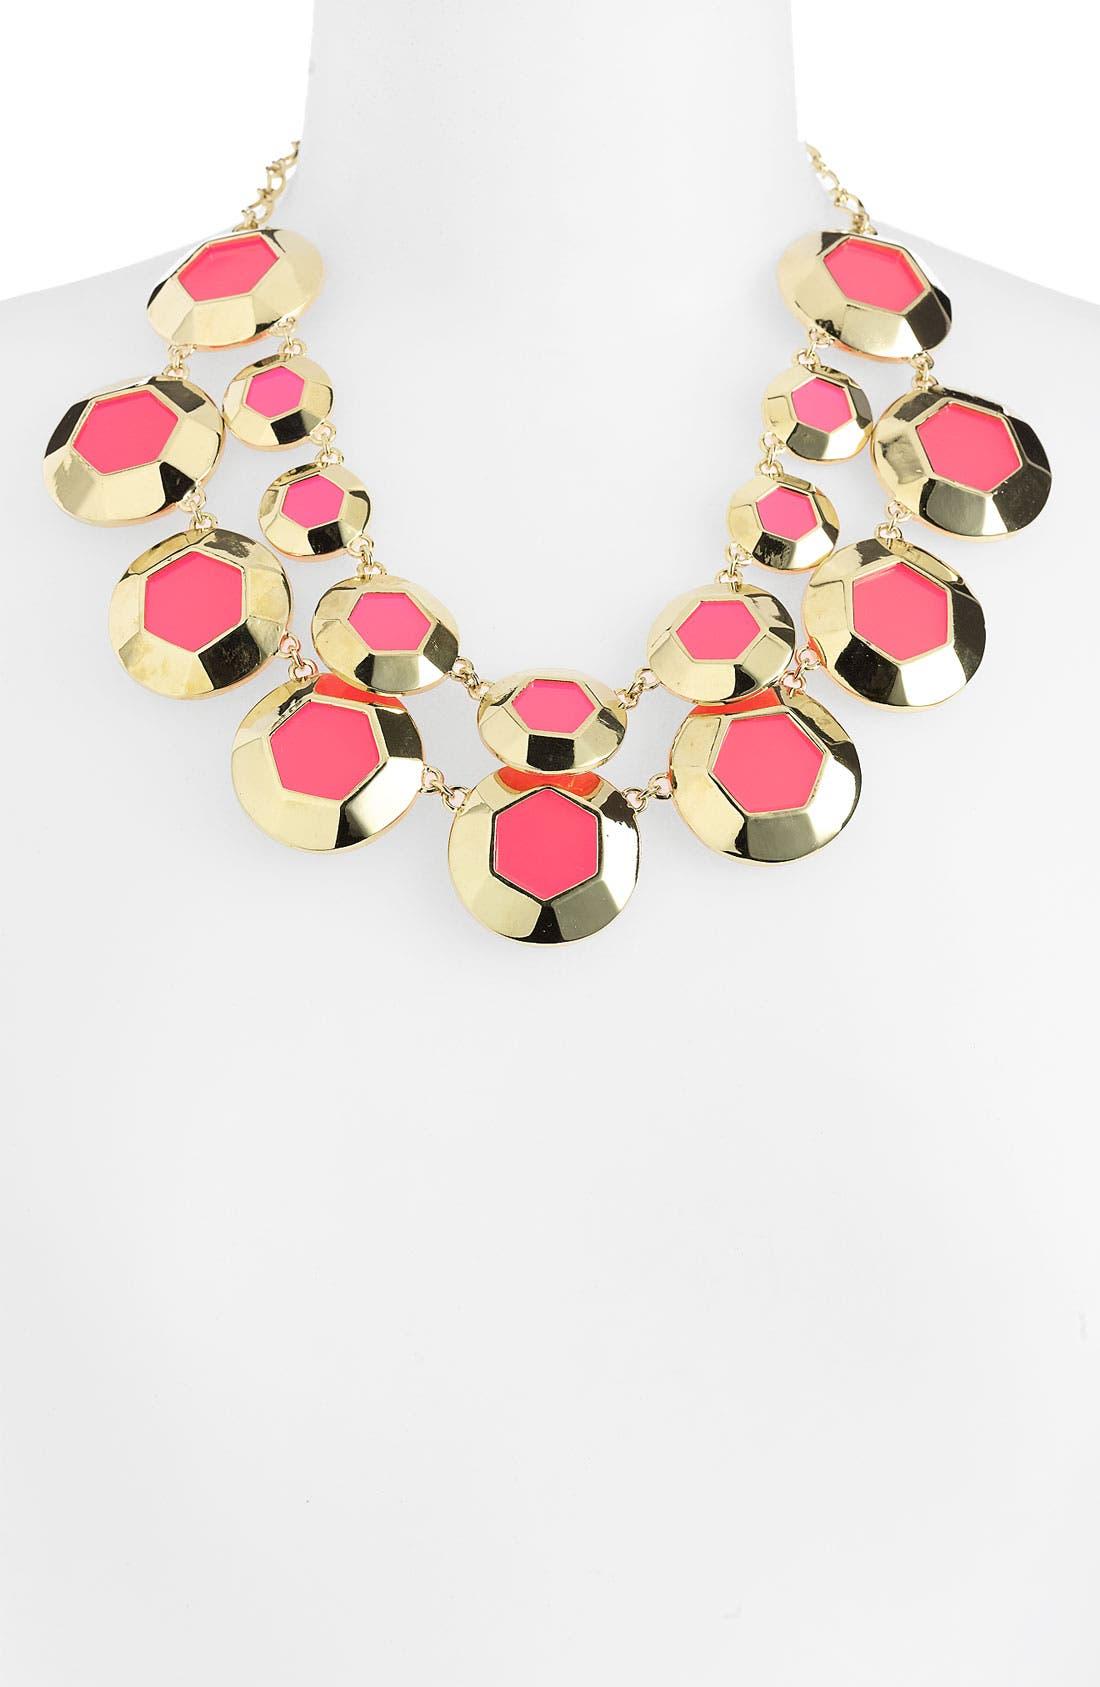 KATE SPADE NEW YORK,                             'bauble box' double row bib necklace,                             Alternate thumbnail 2, color,                             670